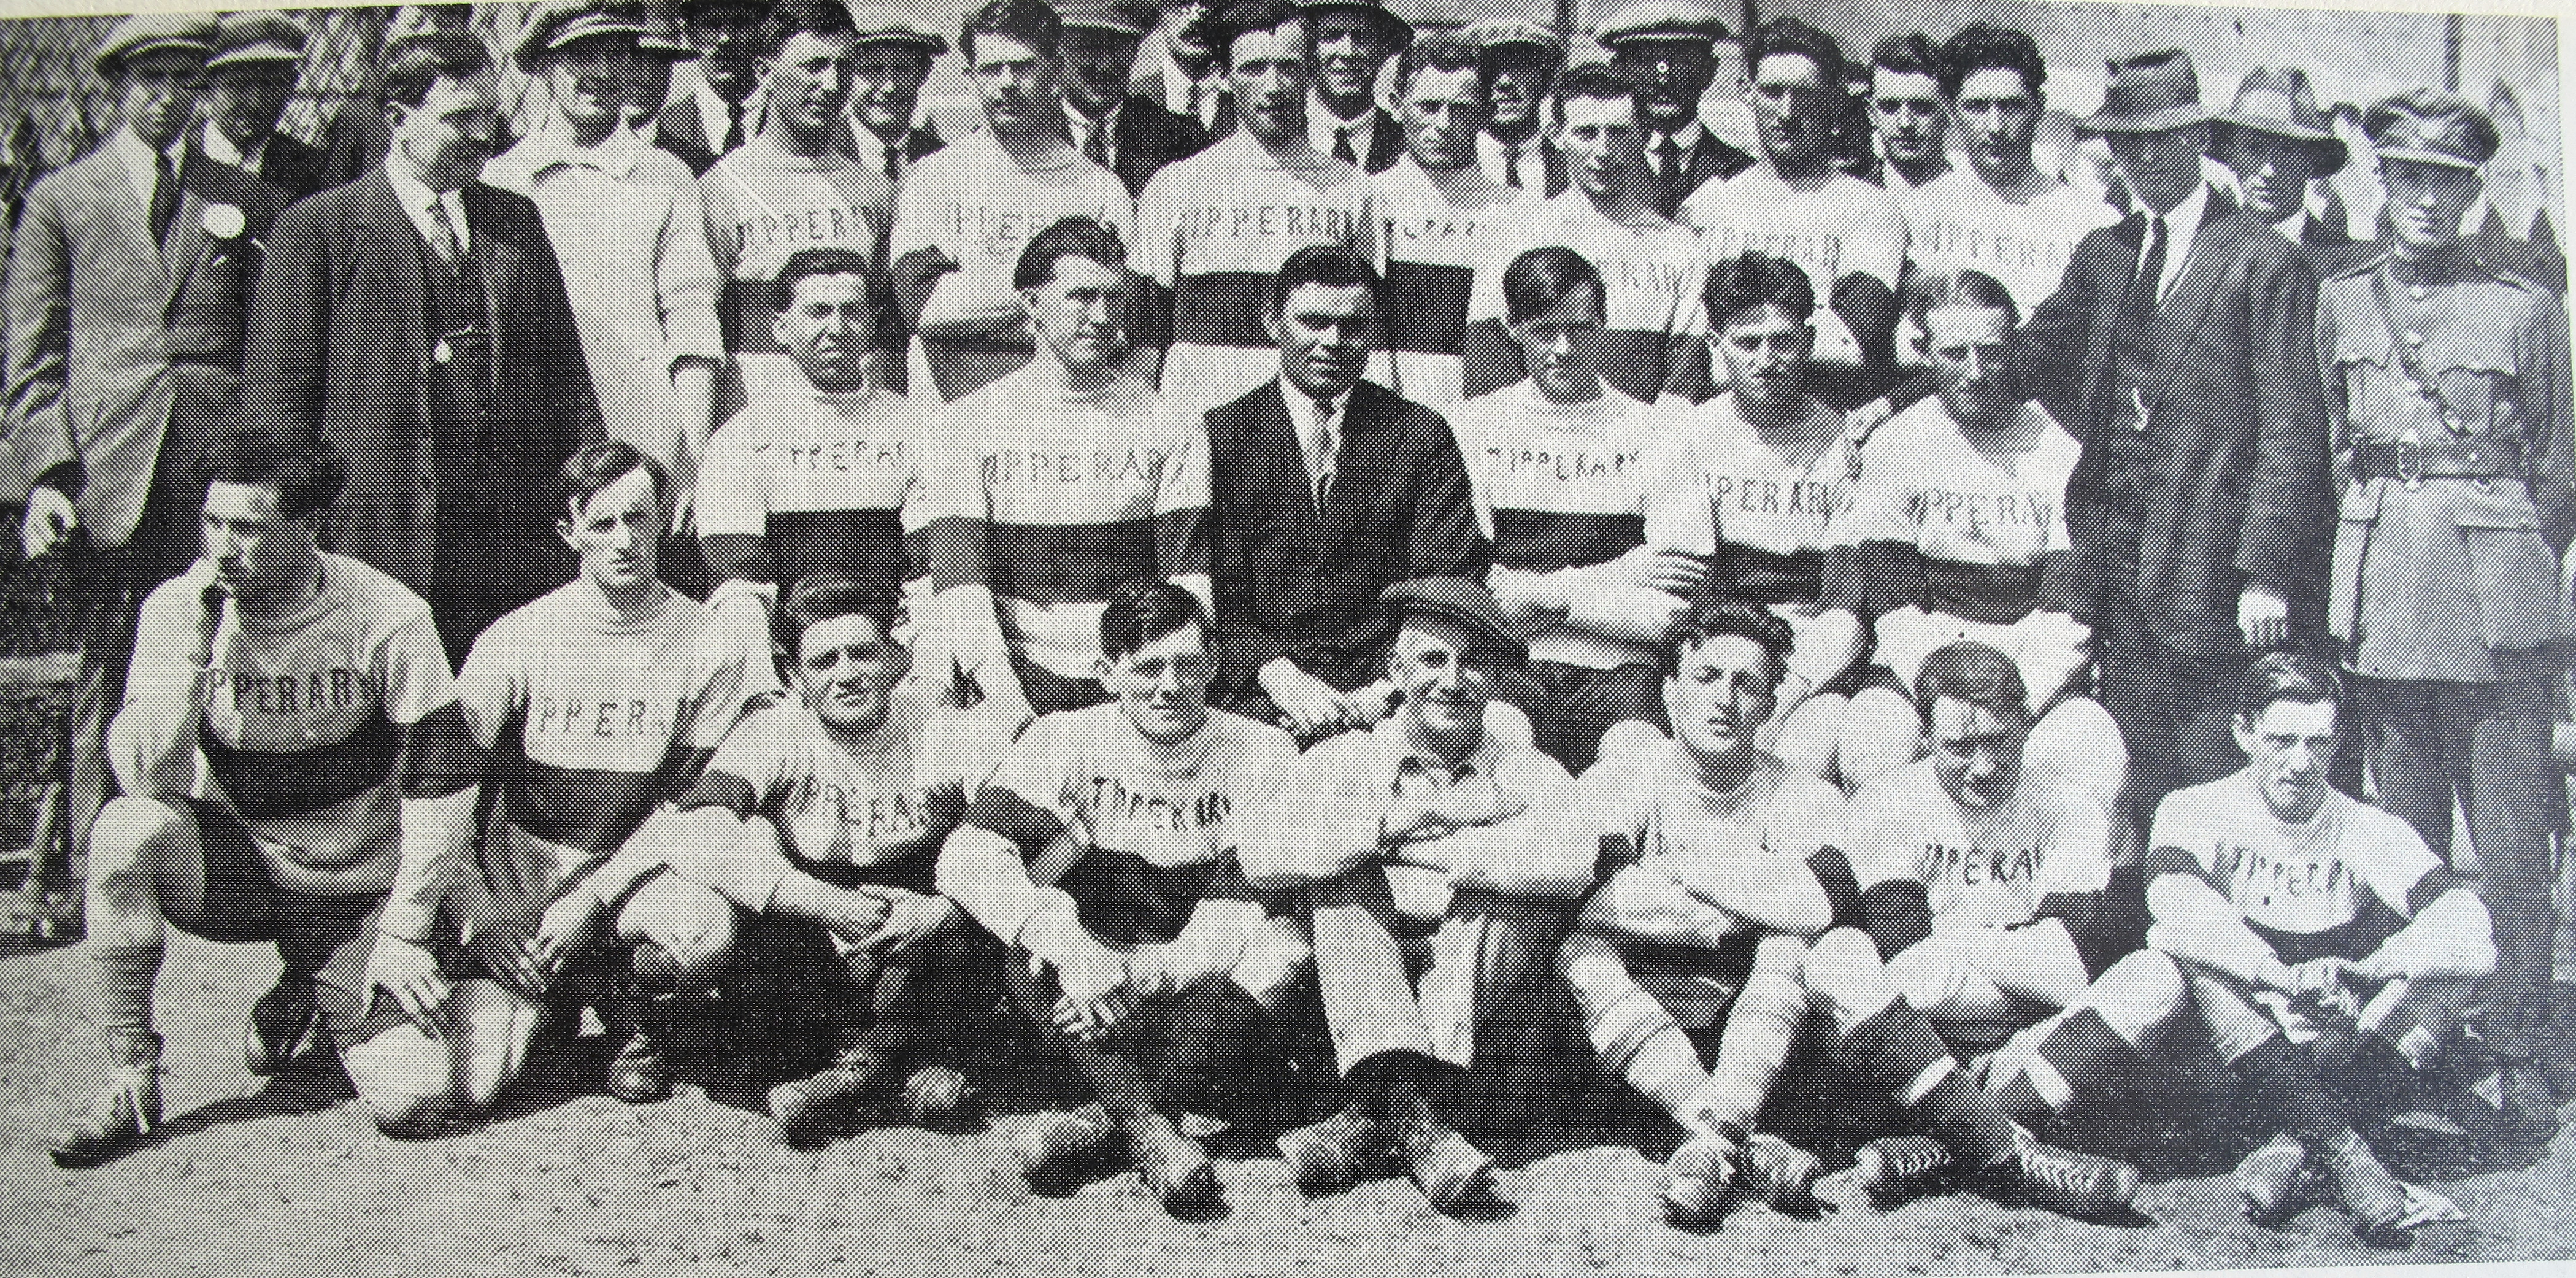 Tipperary 1920 Football All-Ireland Champions